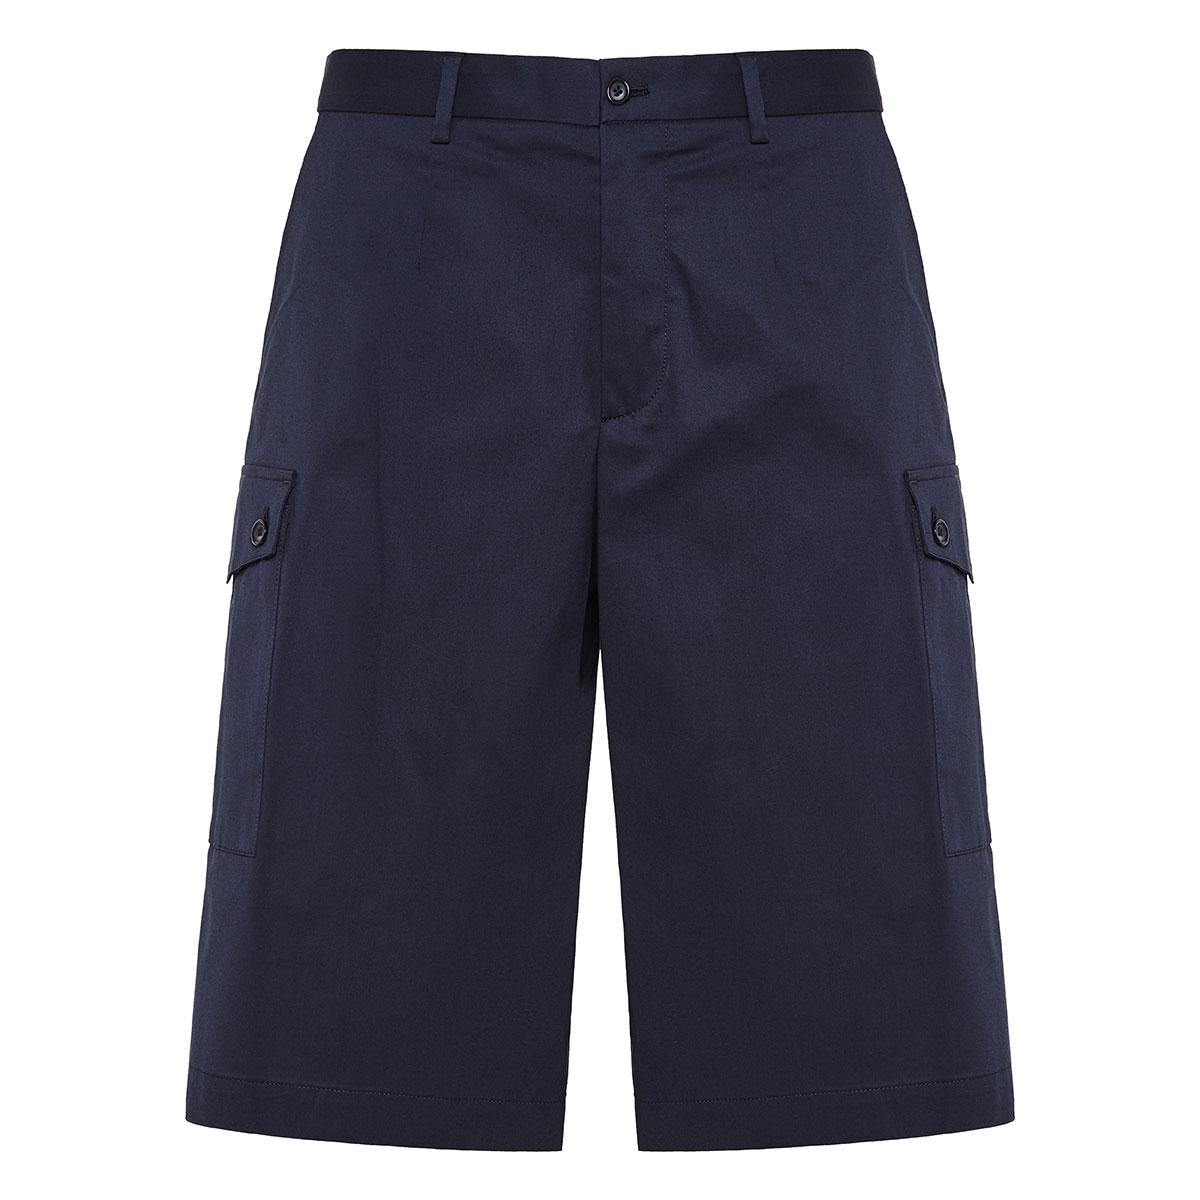 Wide-leg bermuda shorts